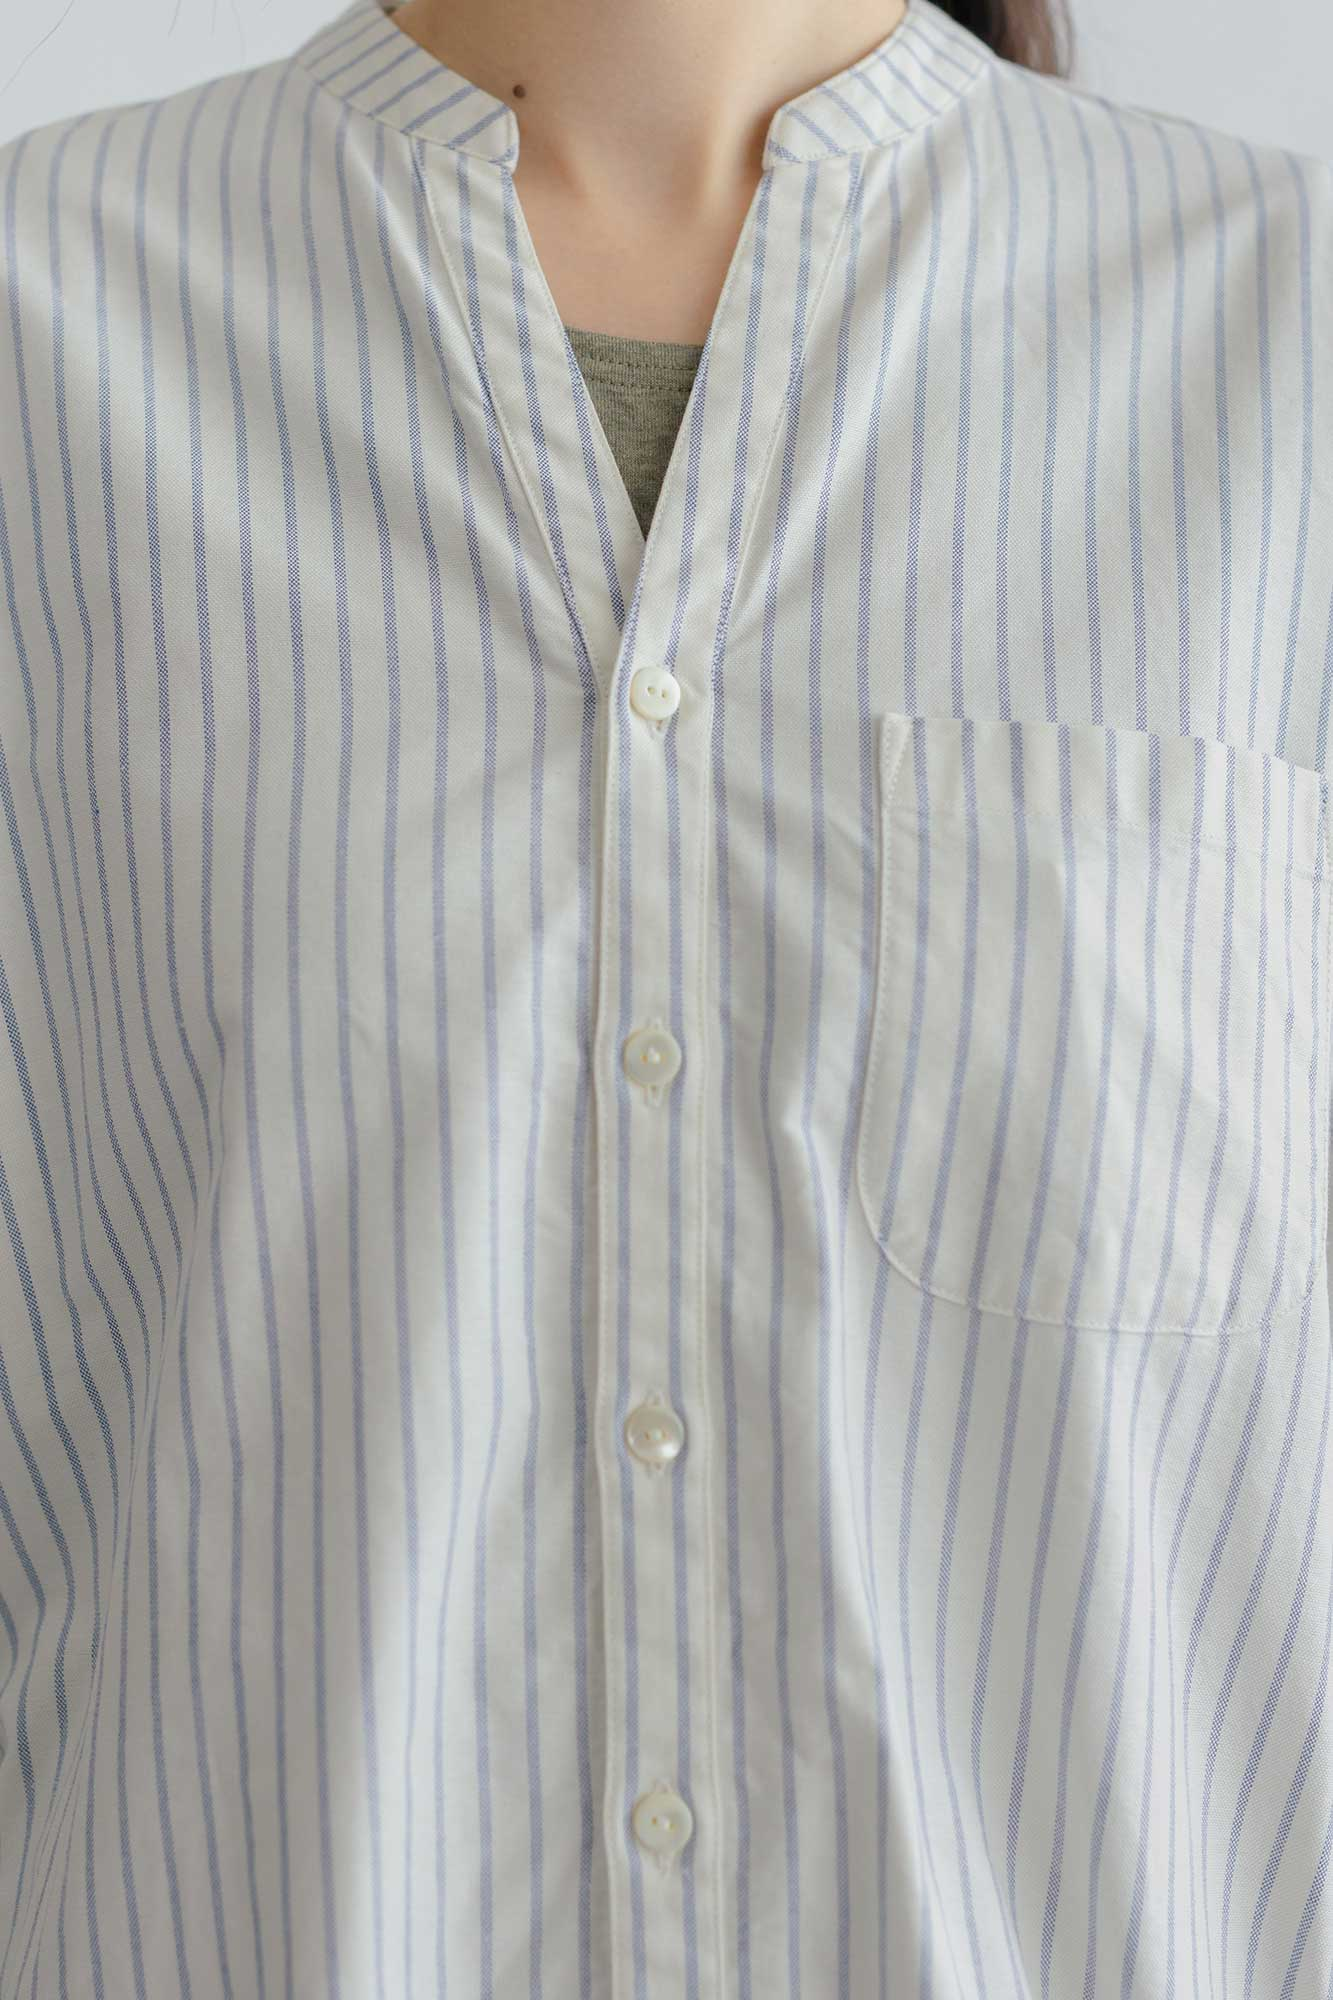 fruits of life バンドカラーナイトシャツ[お取寄商品]